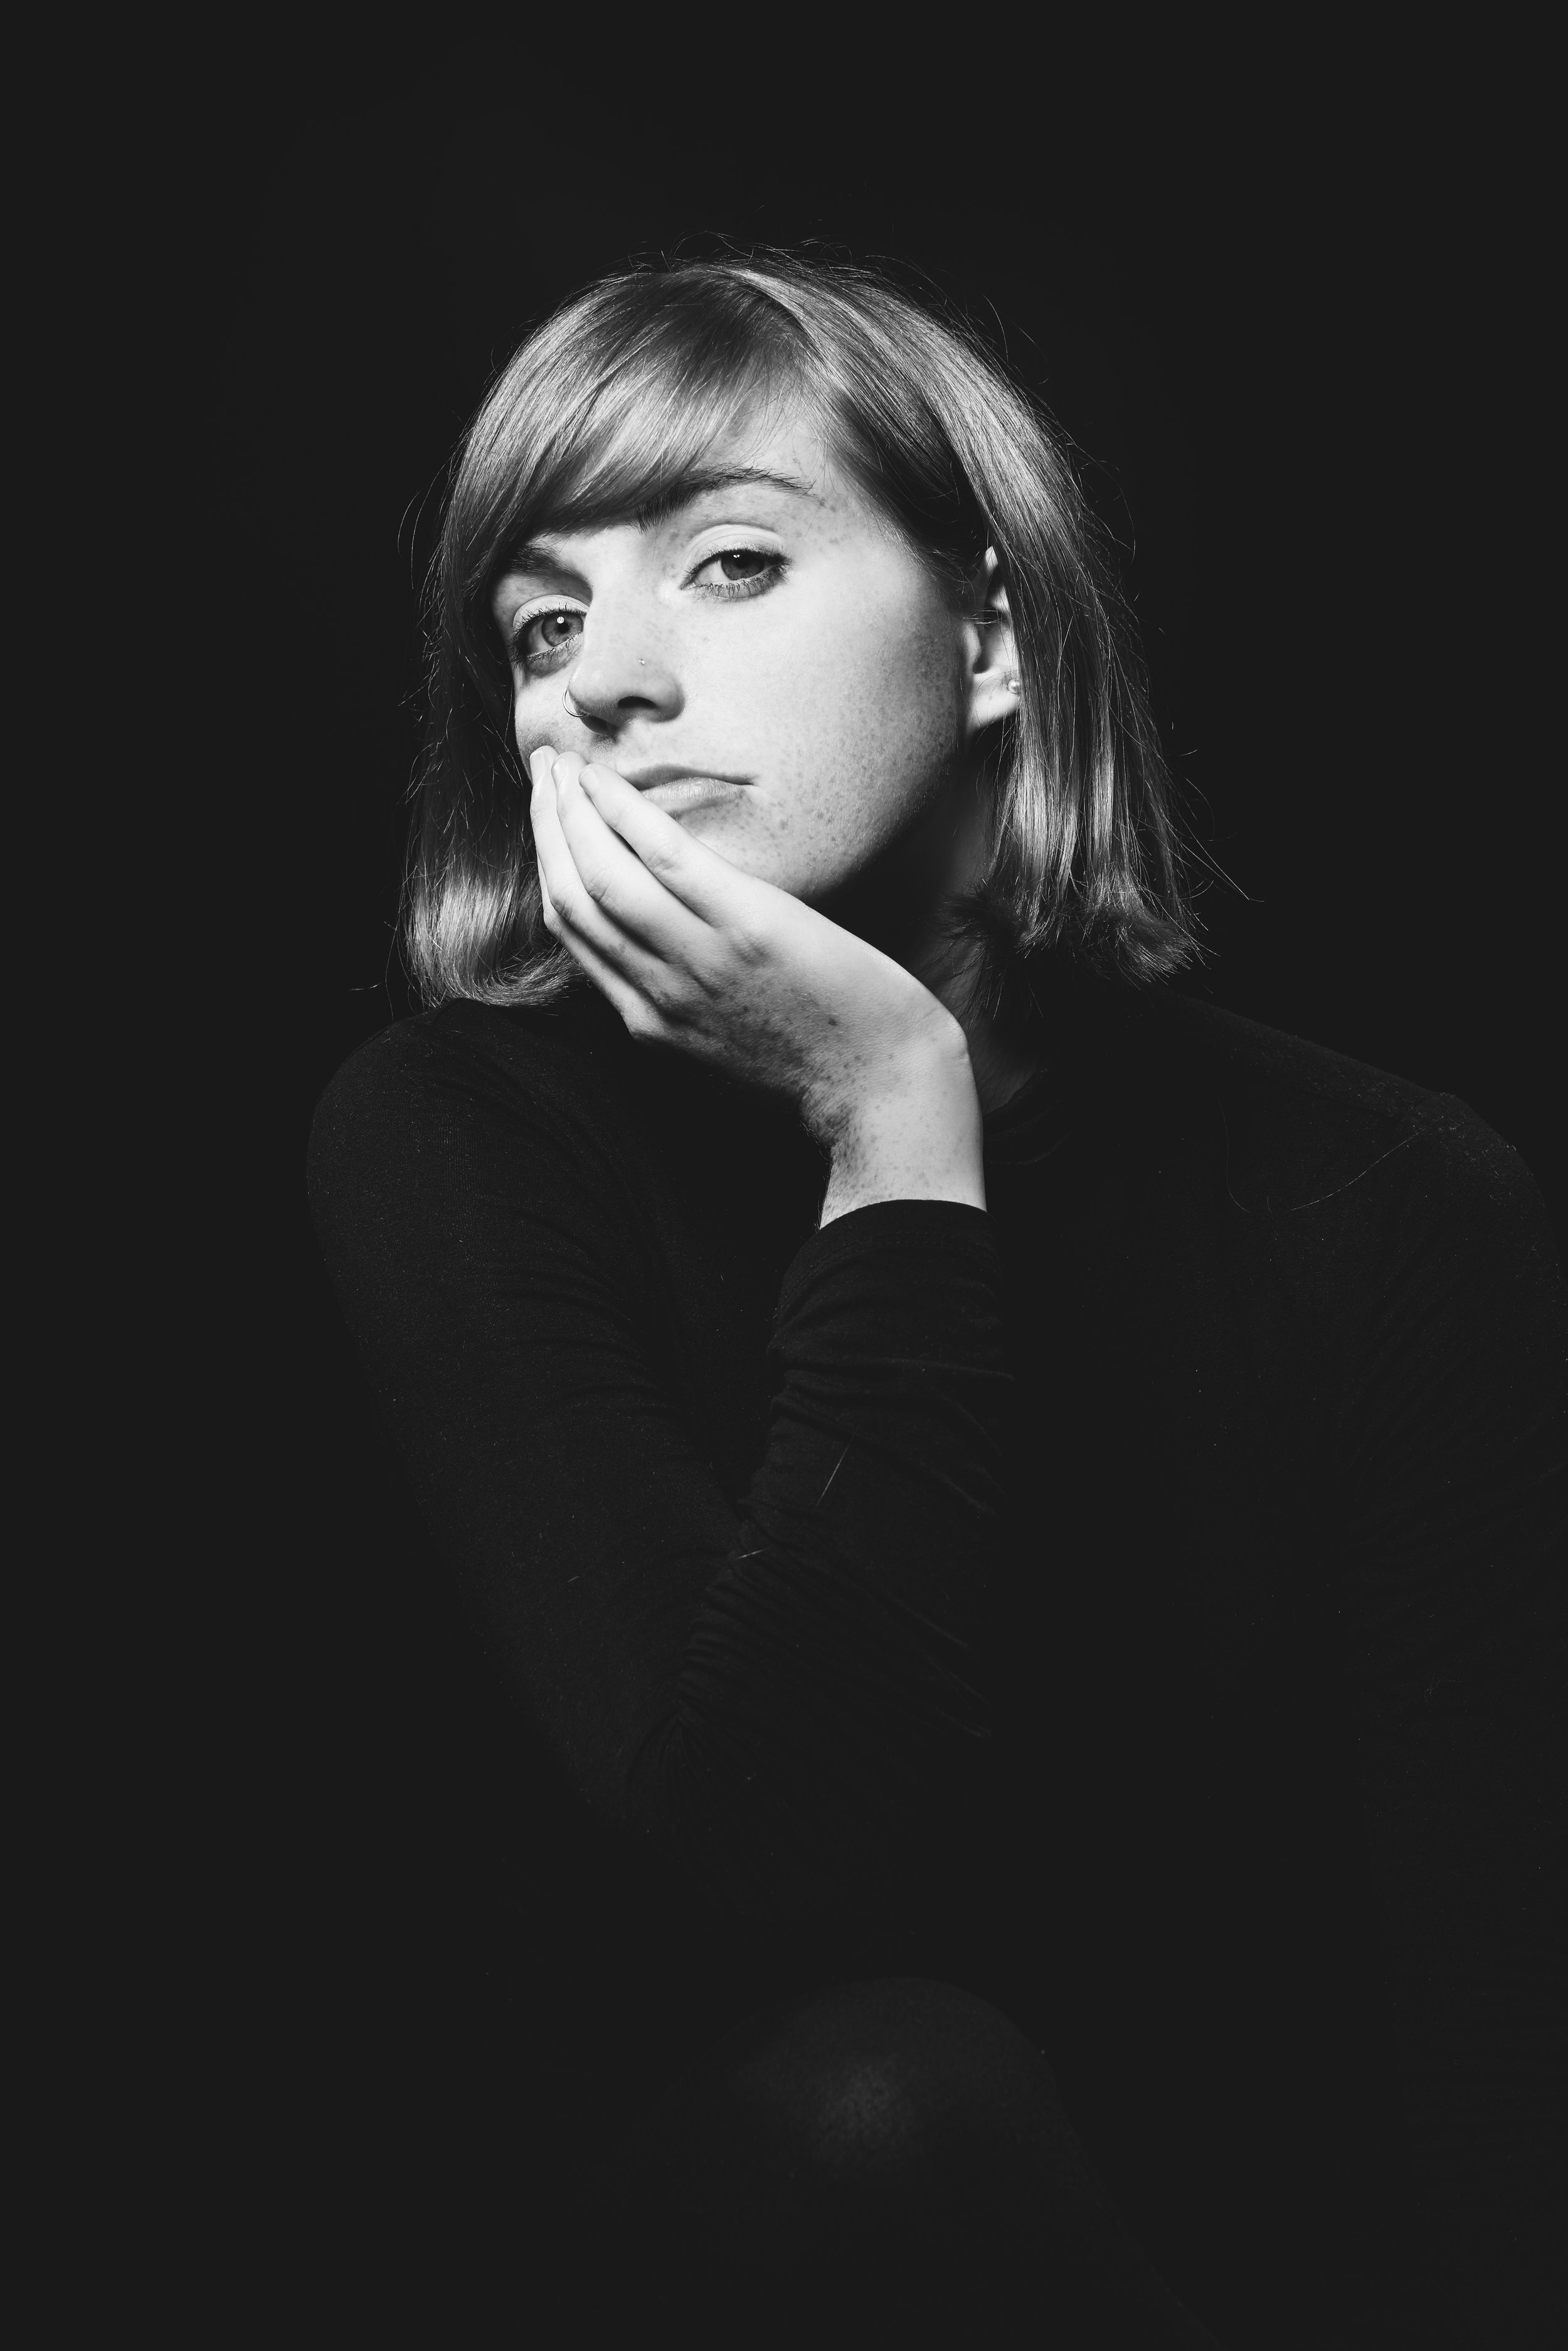 Noir Portraits-0069.jpg